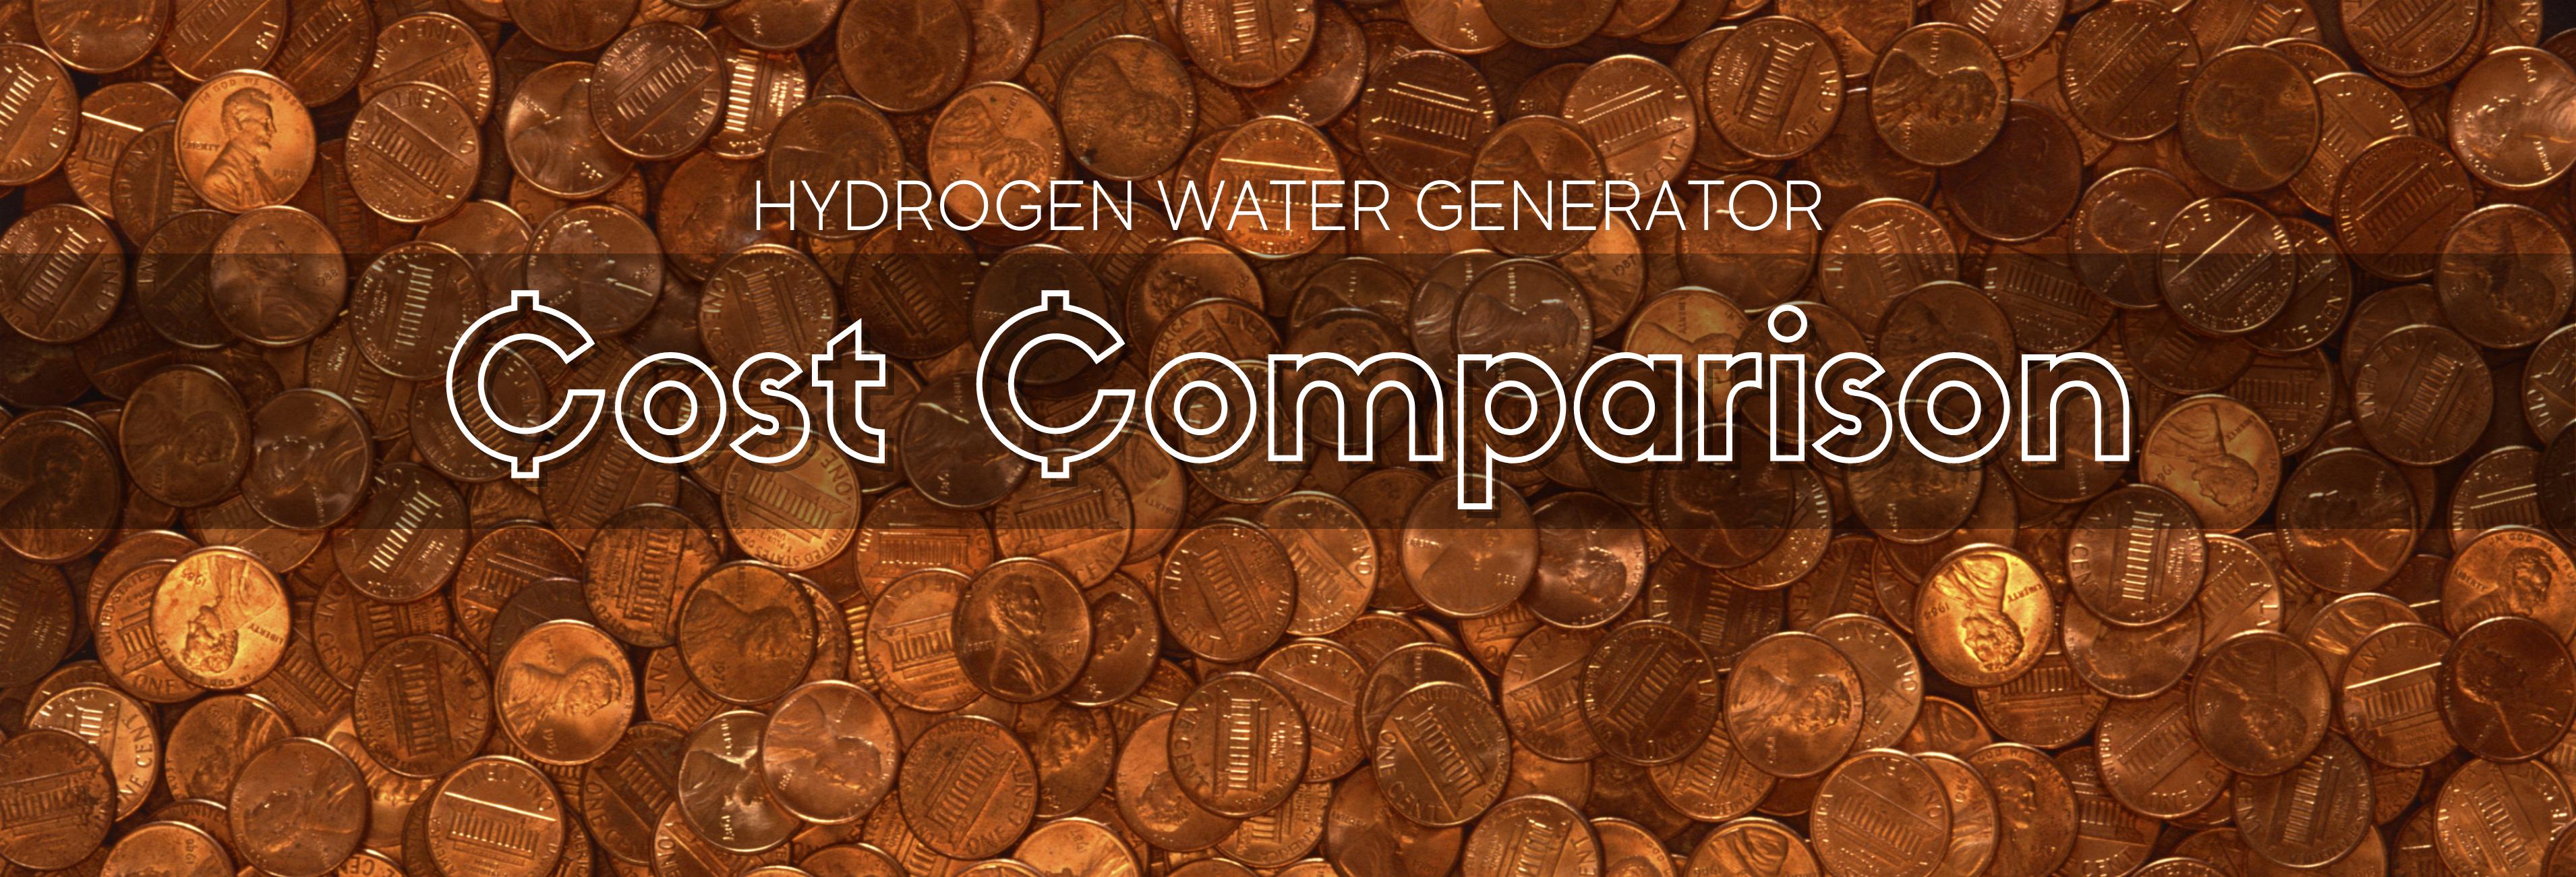 Best Hydrogen Water Generators